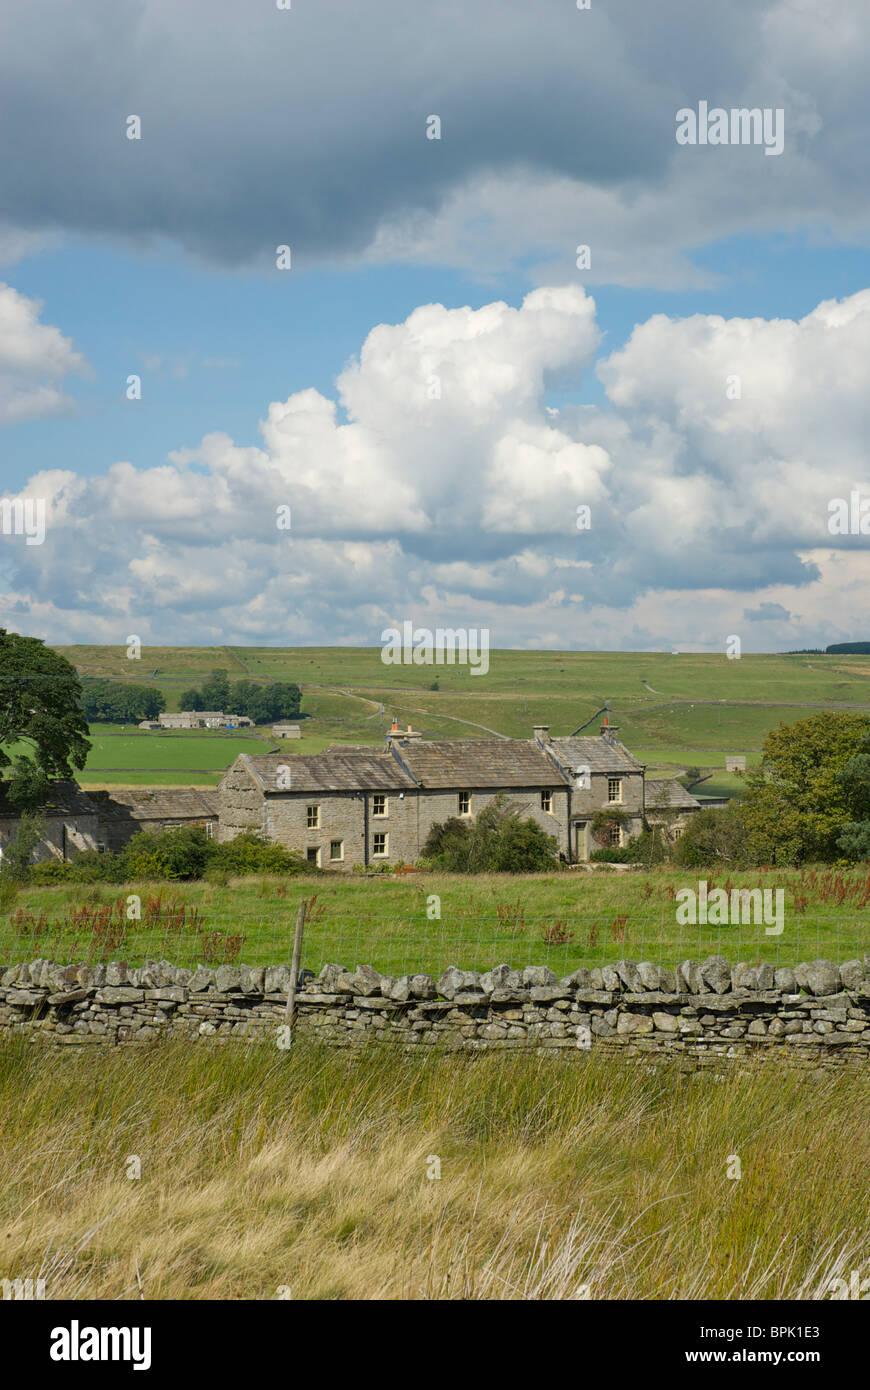 Farmhouse, Baldersdale, County Durham, England UK Stock Photo